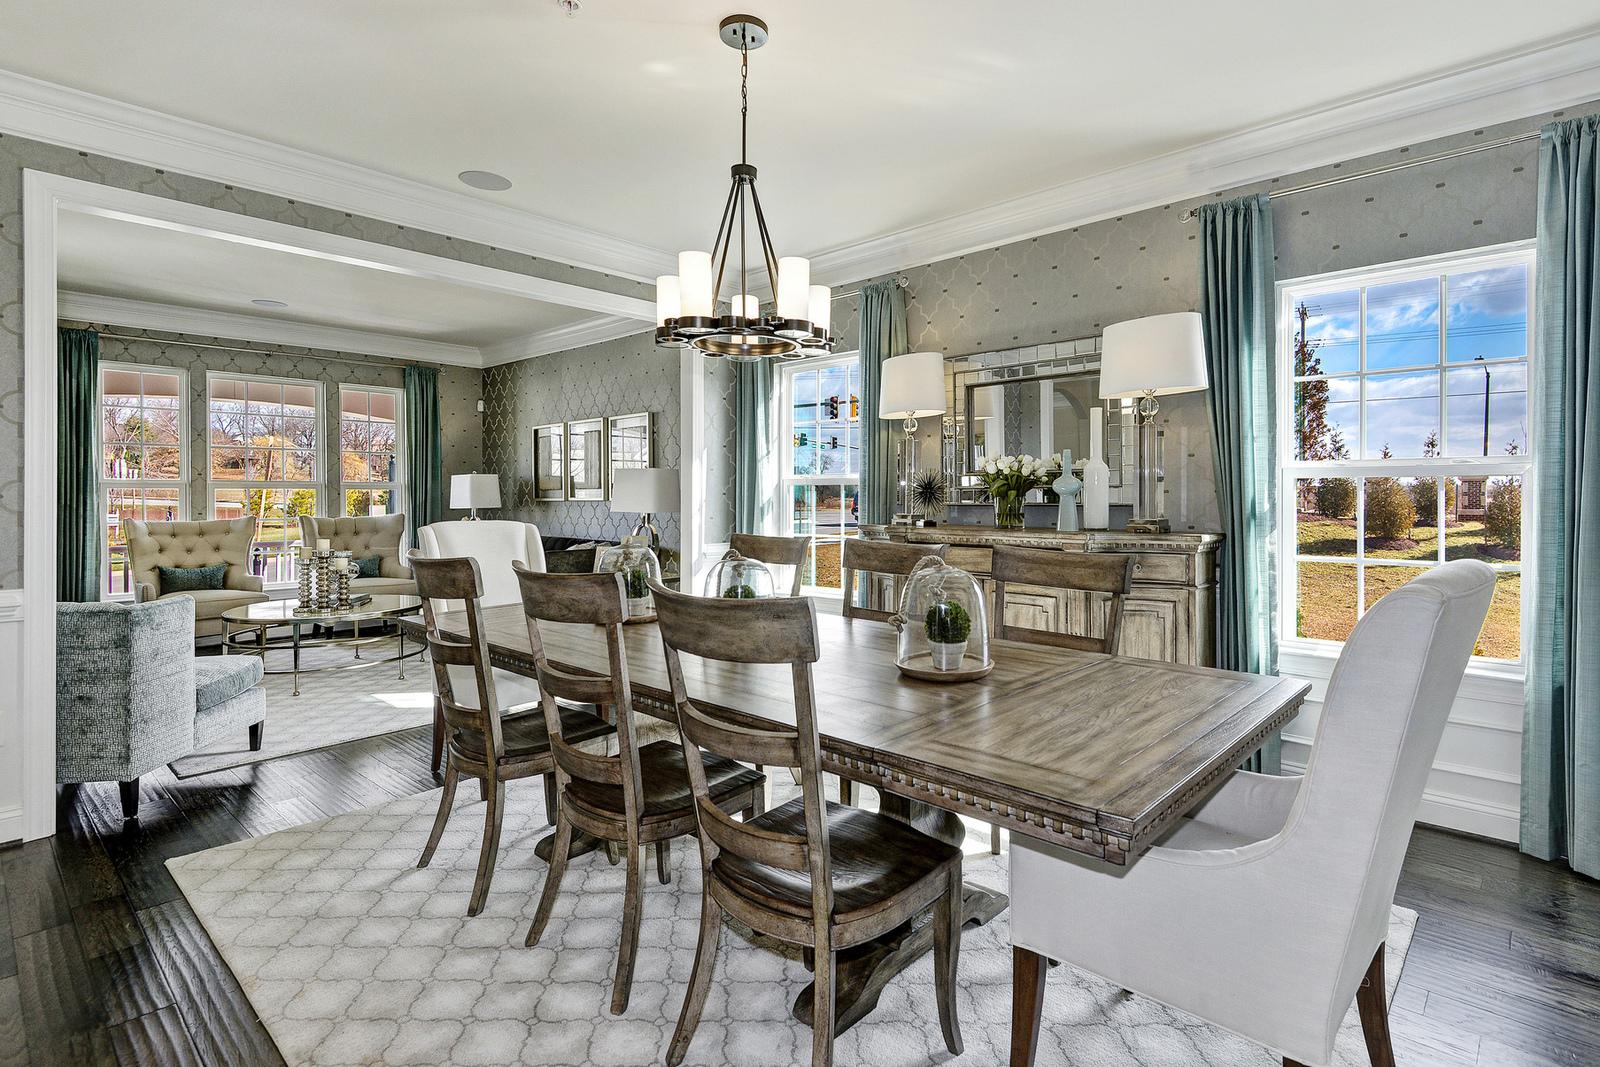 Virginia Manor - Single-Family Homes